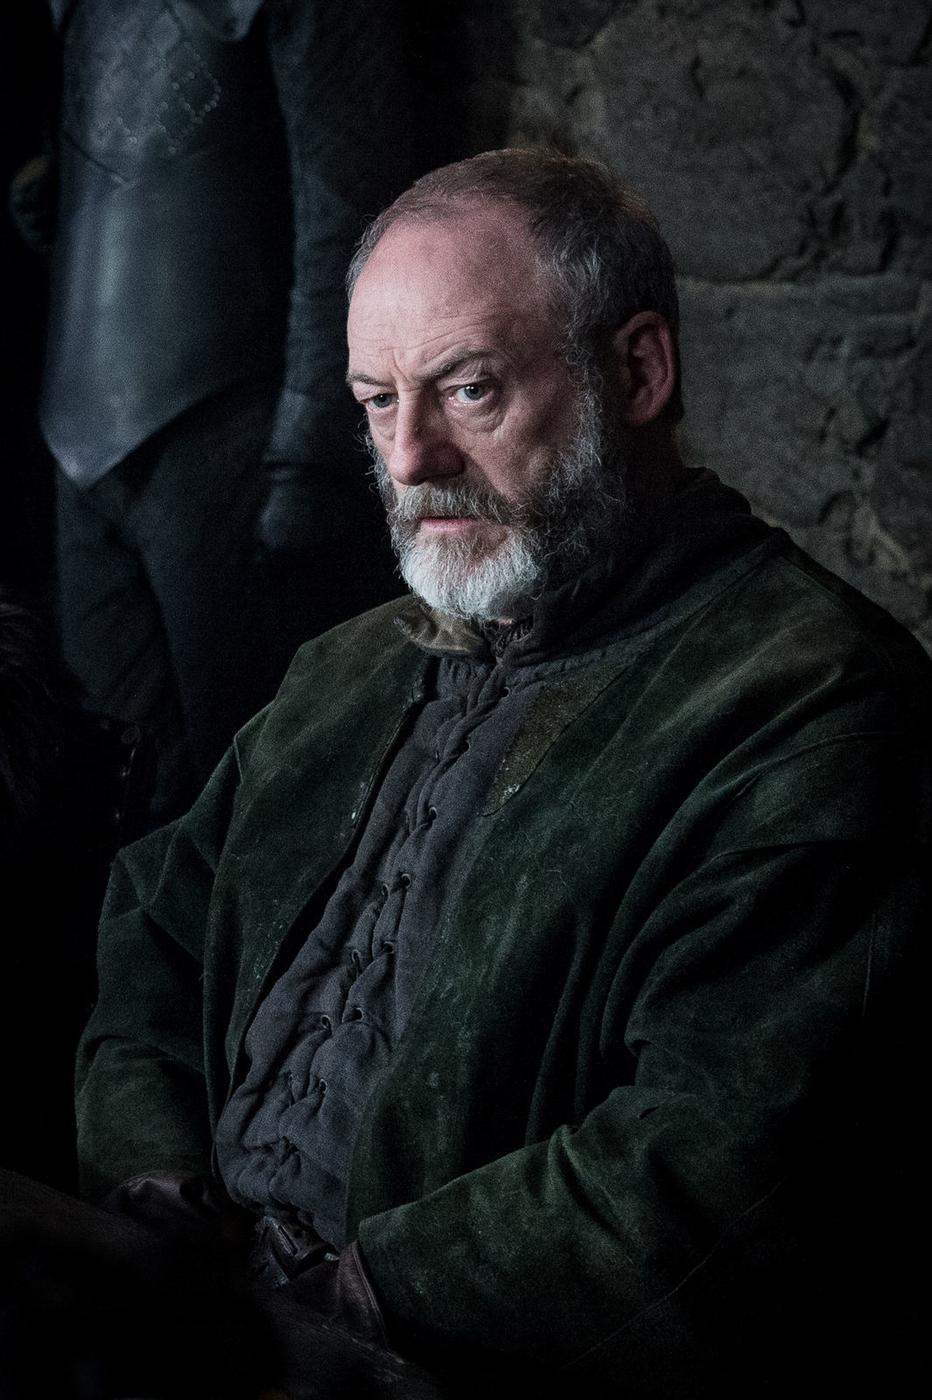 Davos Game of Thrones Season 8 Helen Sloan HBO.jpg